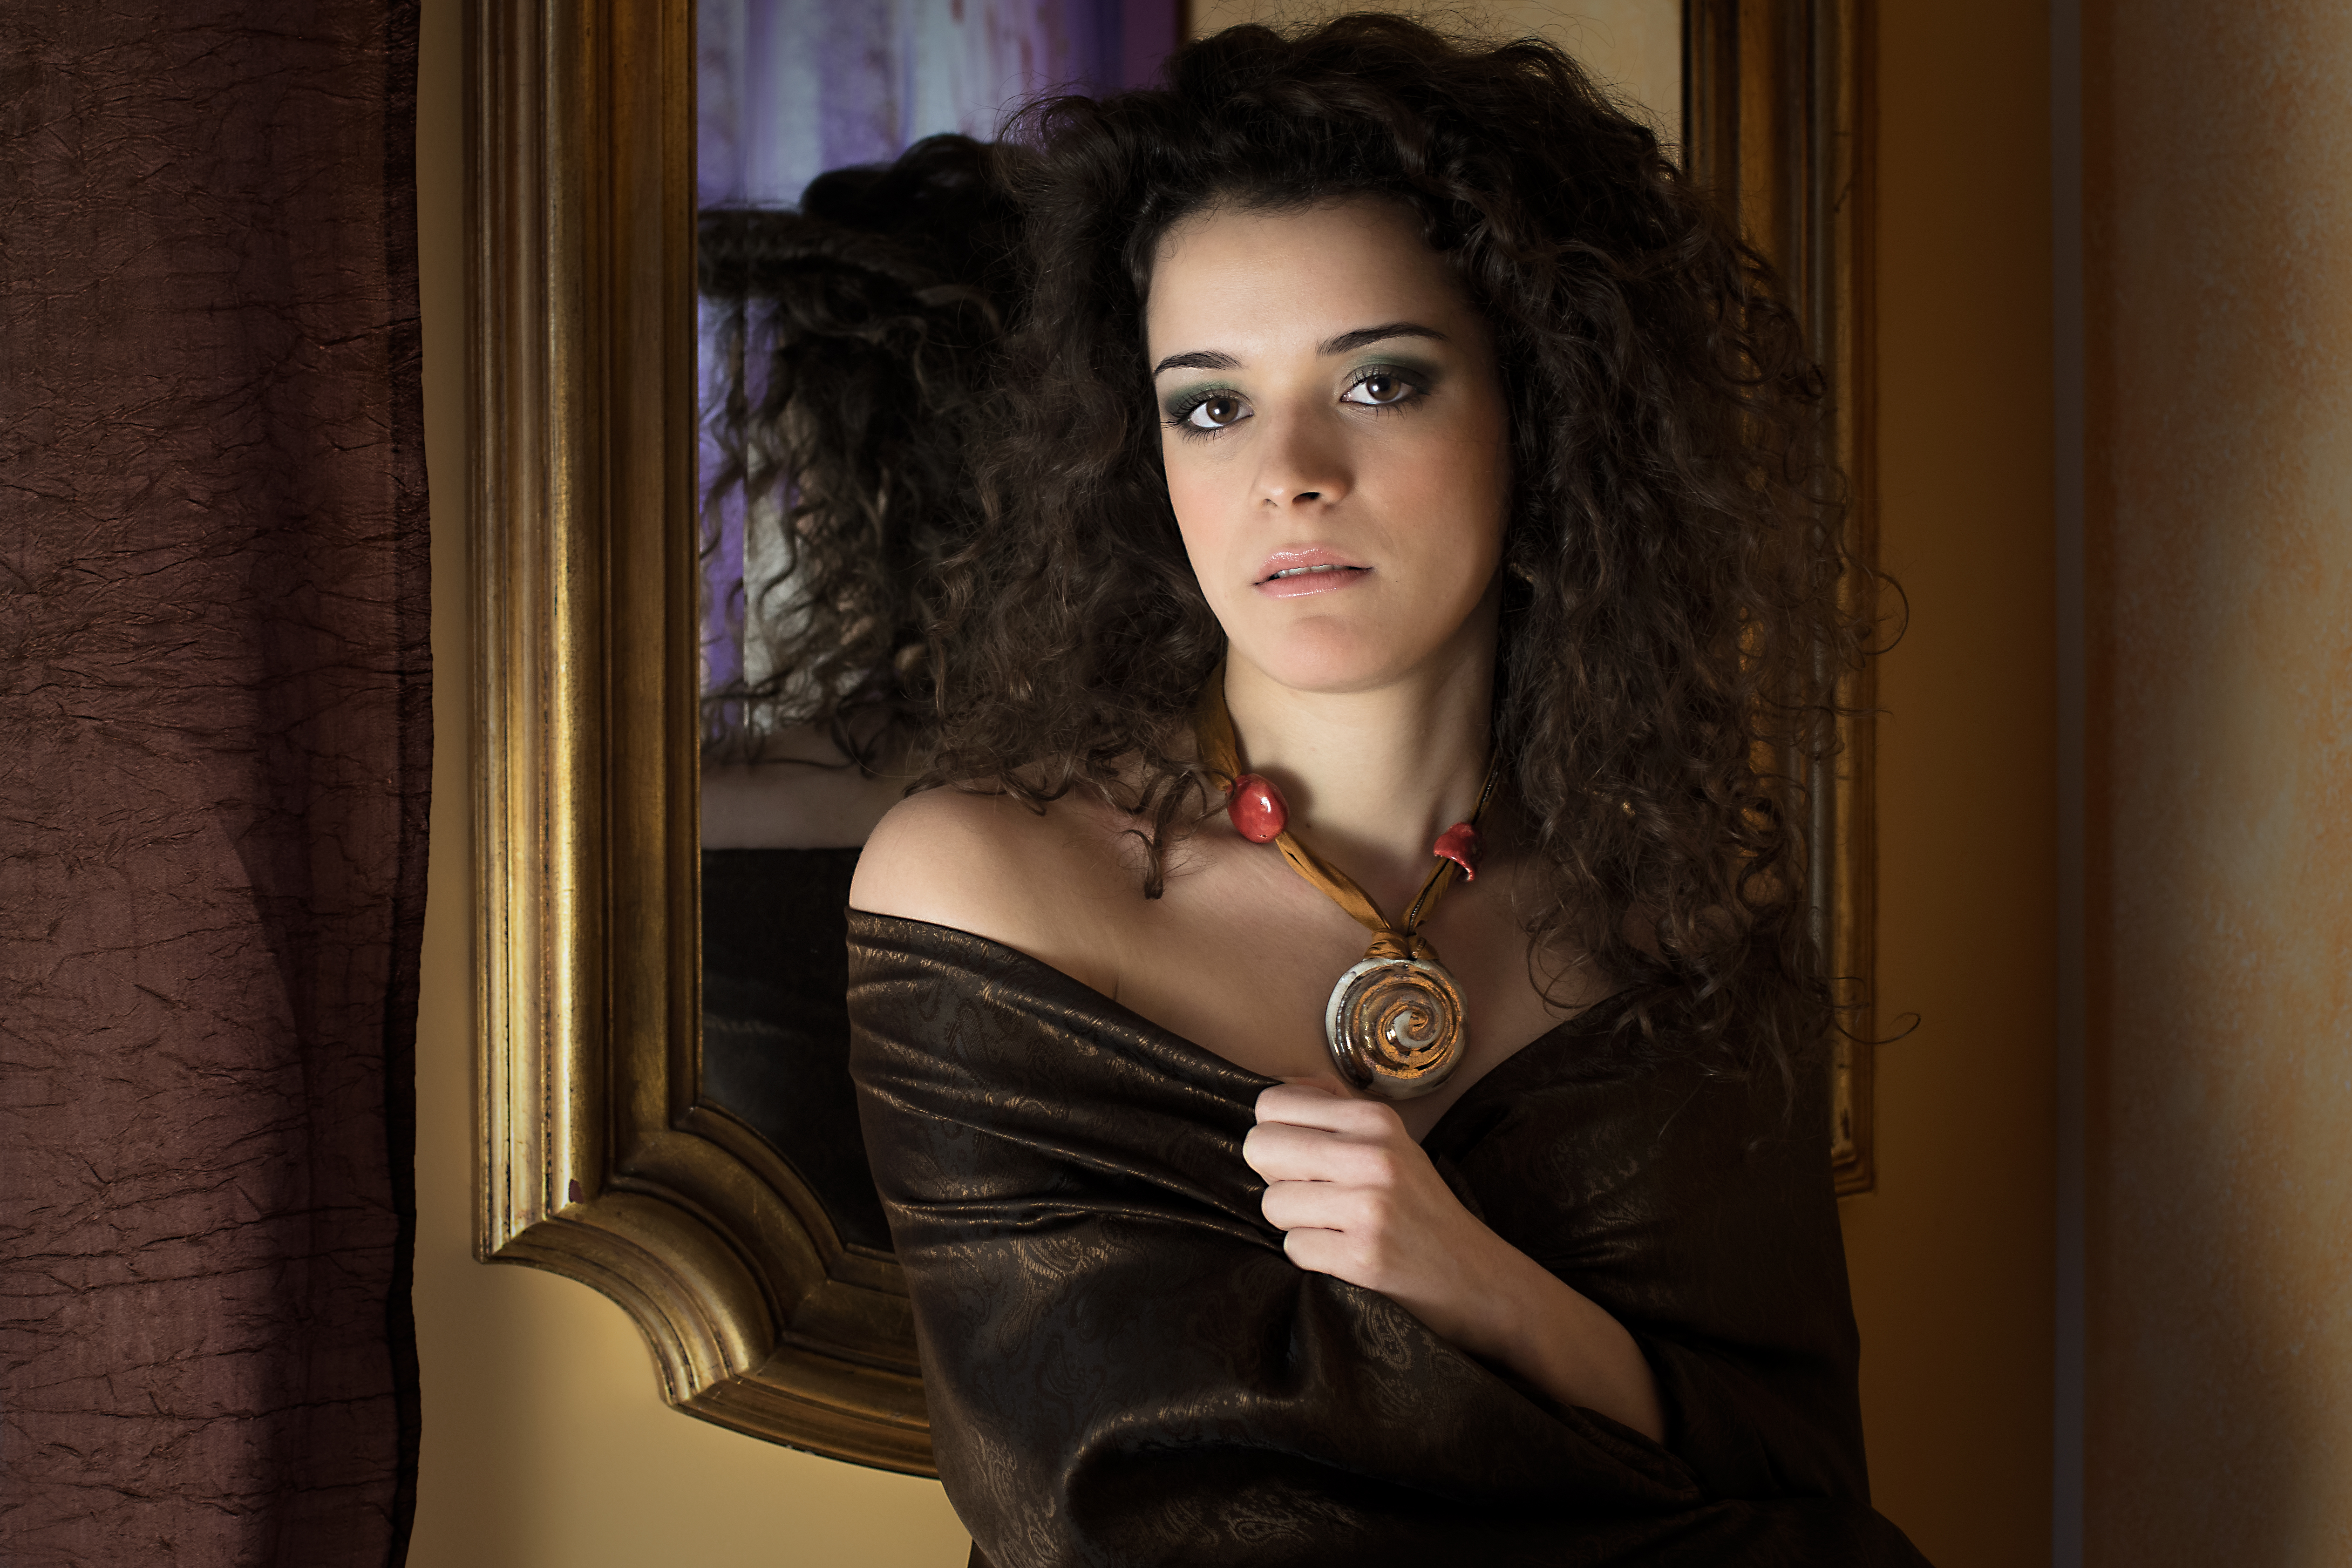 Model Martina Riccioni